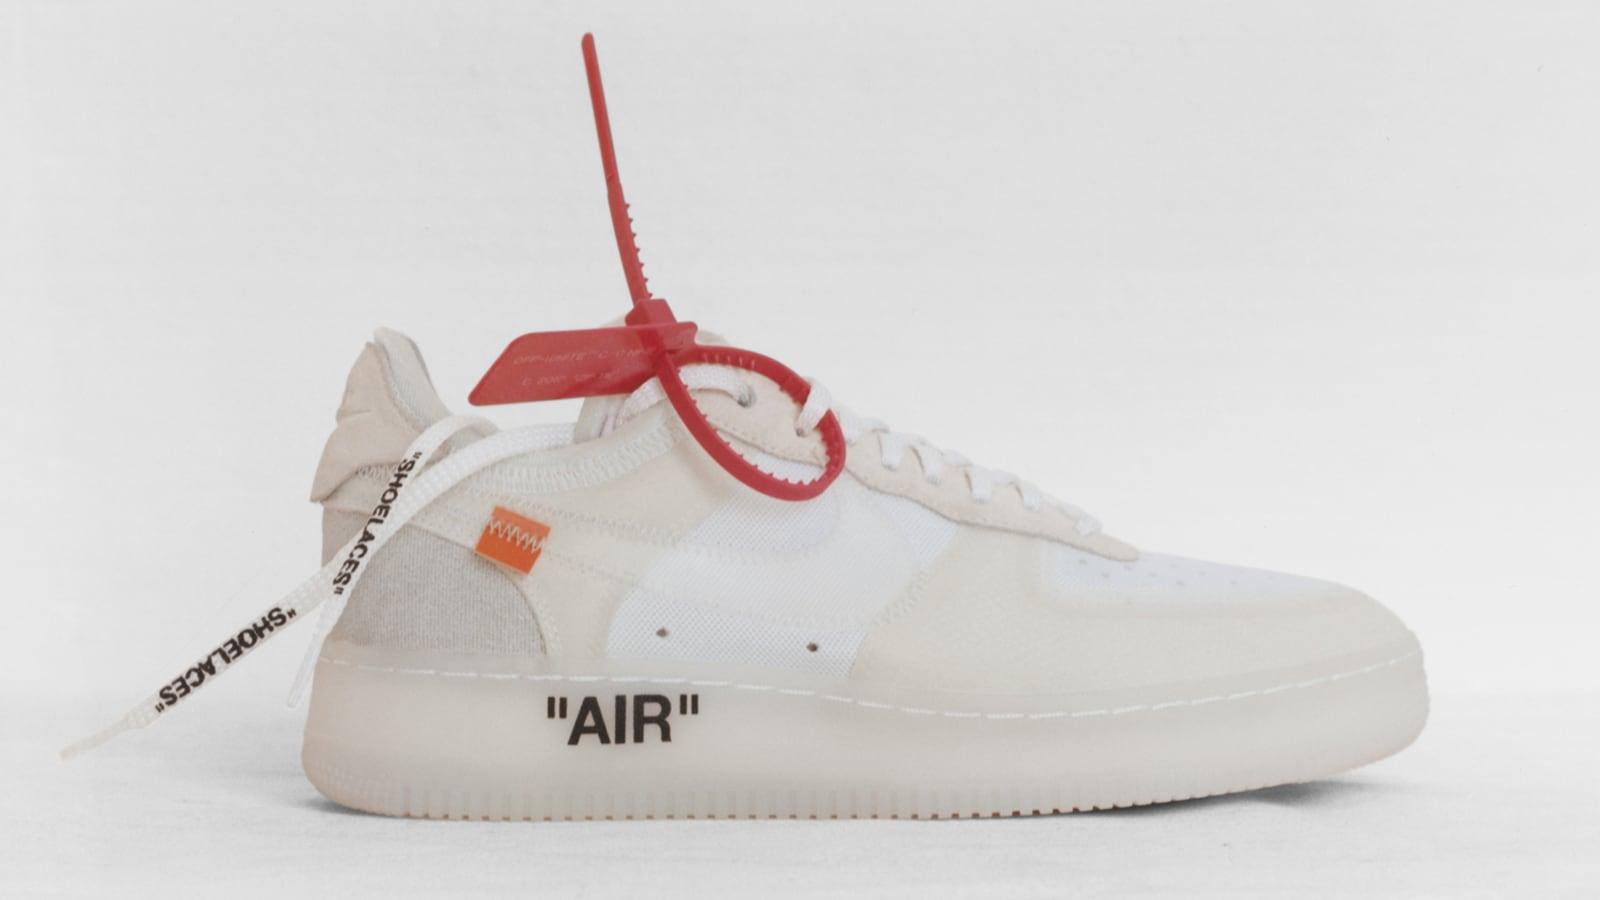 Nike Air Force 1 Low x Virgil Abloh